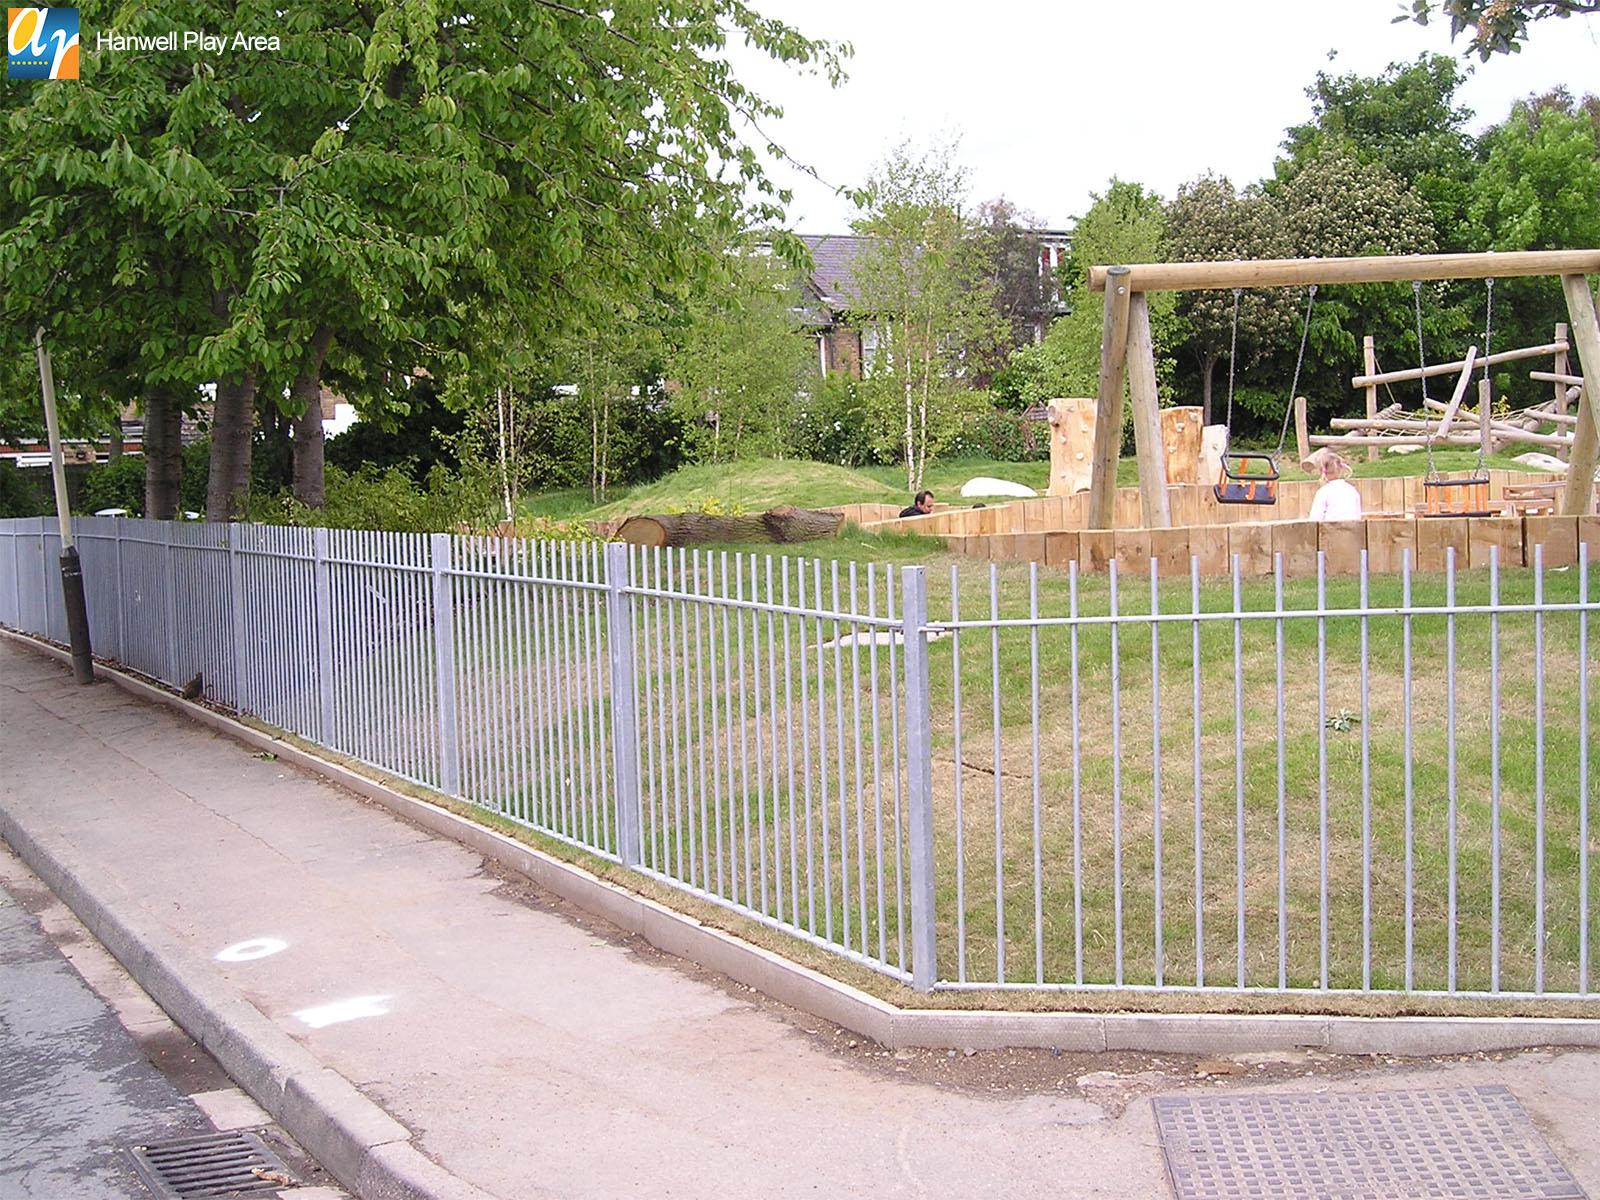 Hanwell Play Area